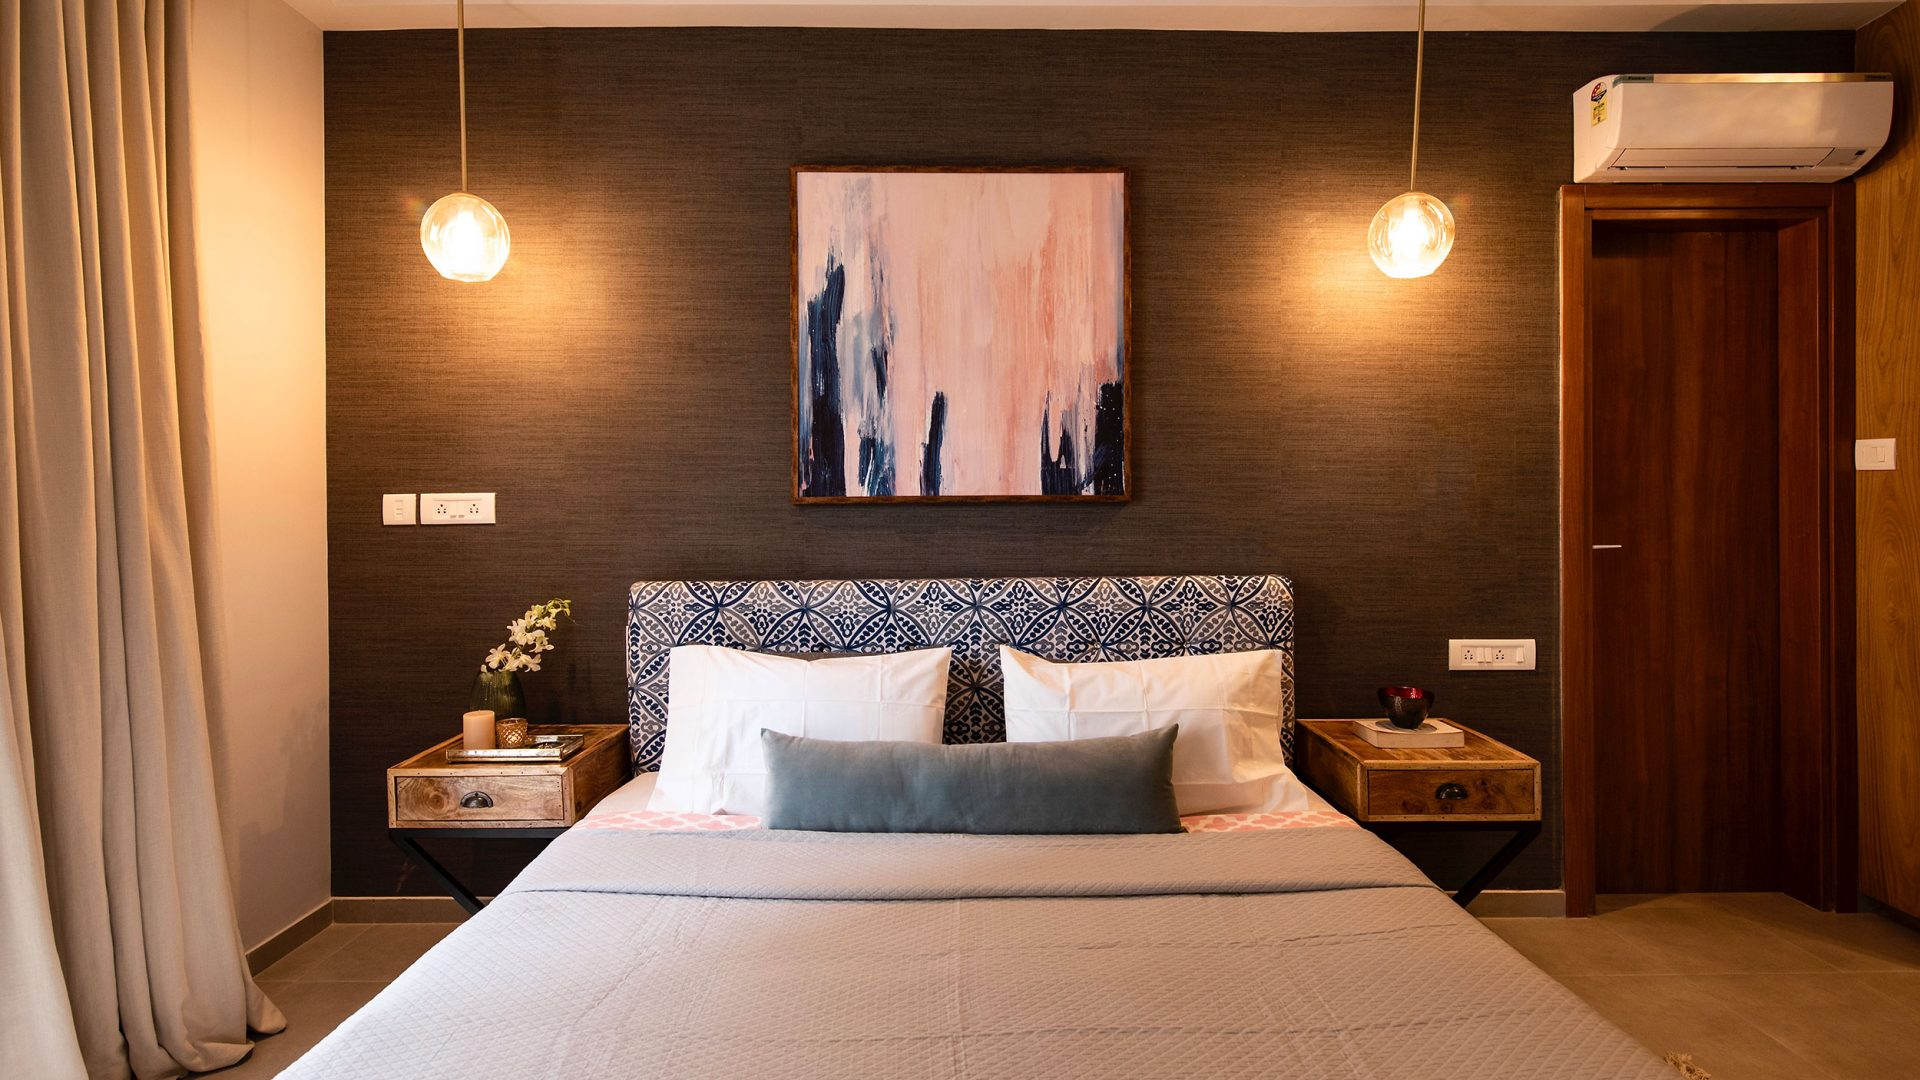 Bedroom interior design in Delhi-NCR Call Now 9911991352 ...